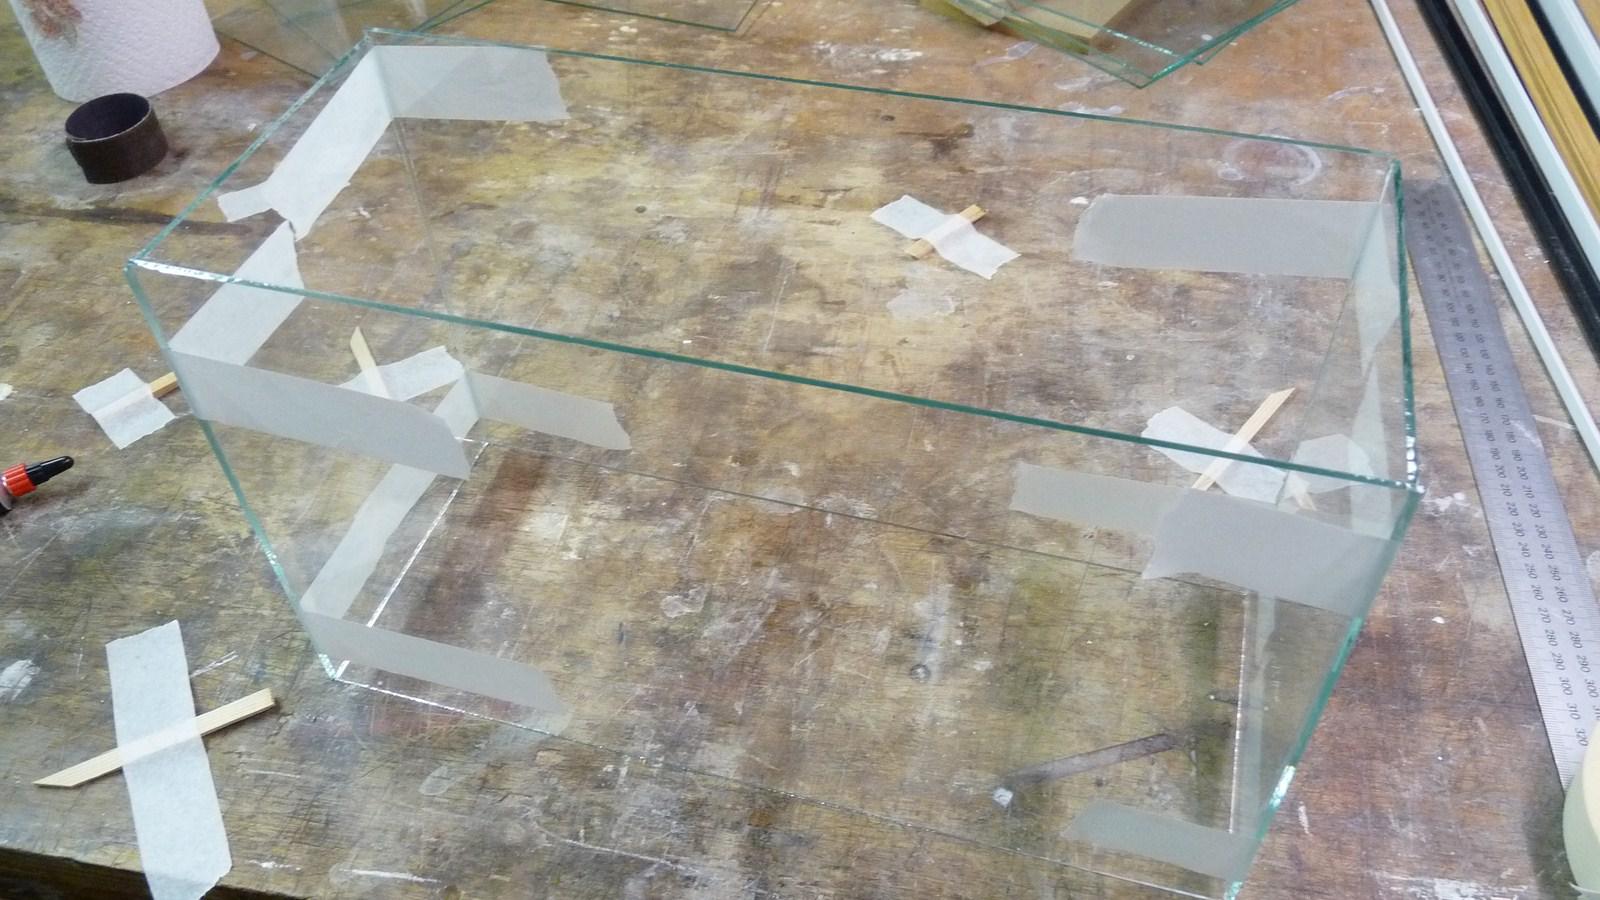 Fabriquer ses propres vitrines en verre 17071907263923134915156547